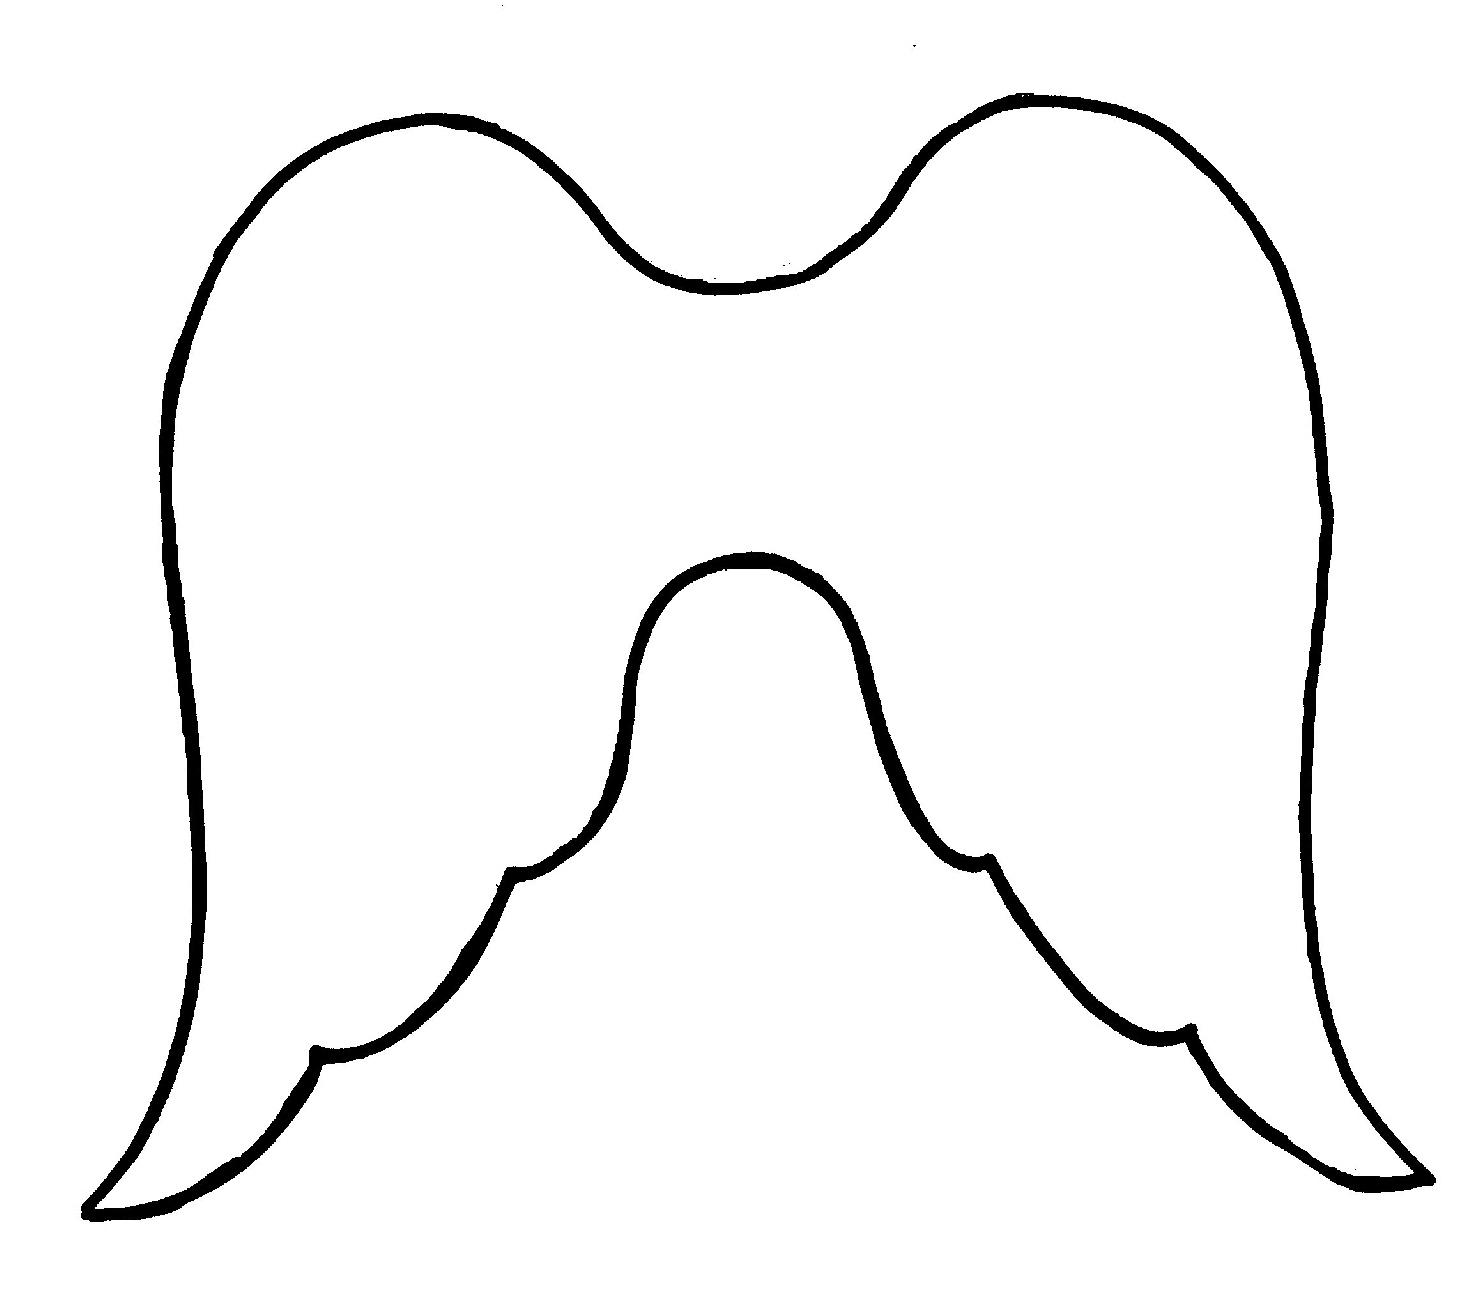 Angel wing stencil clipart jpg Free Angel Wing Stencil, Download Free Clip Art, Free Clip Art on ... jpg